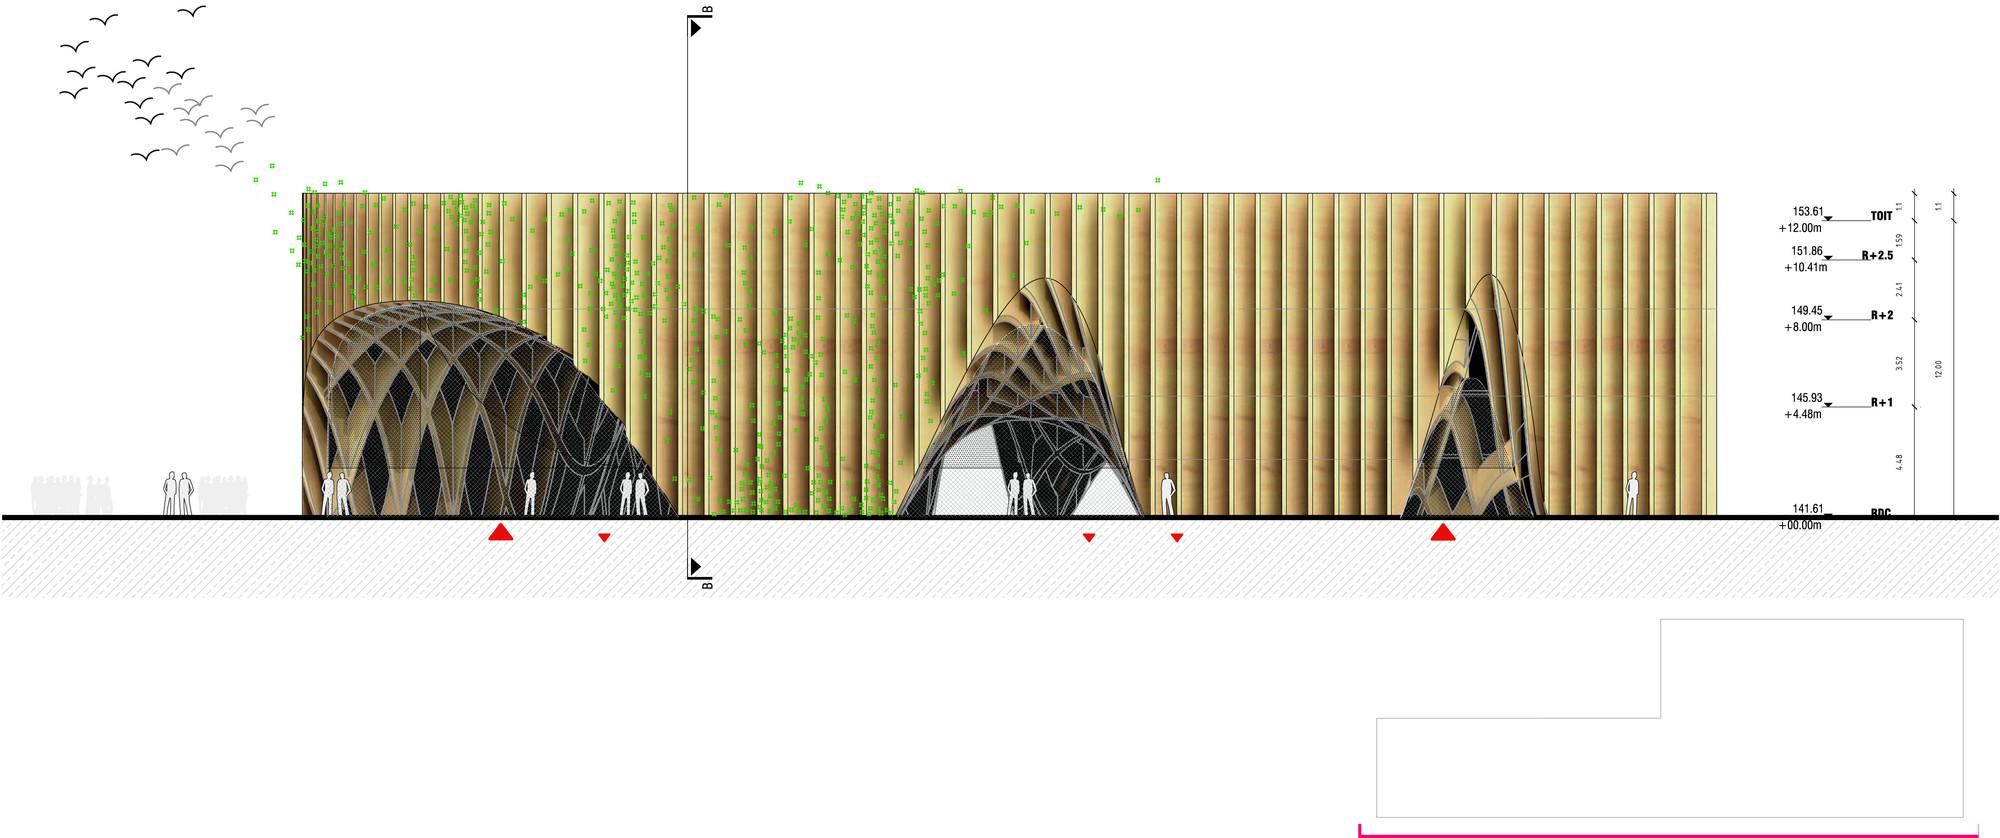 gallery of milan expo 2015 x tu designs latticed fertile market for french pavilion 17. Black Bedroom Furniture Sets. Home Design Ideas